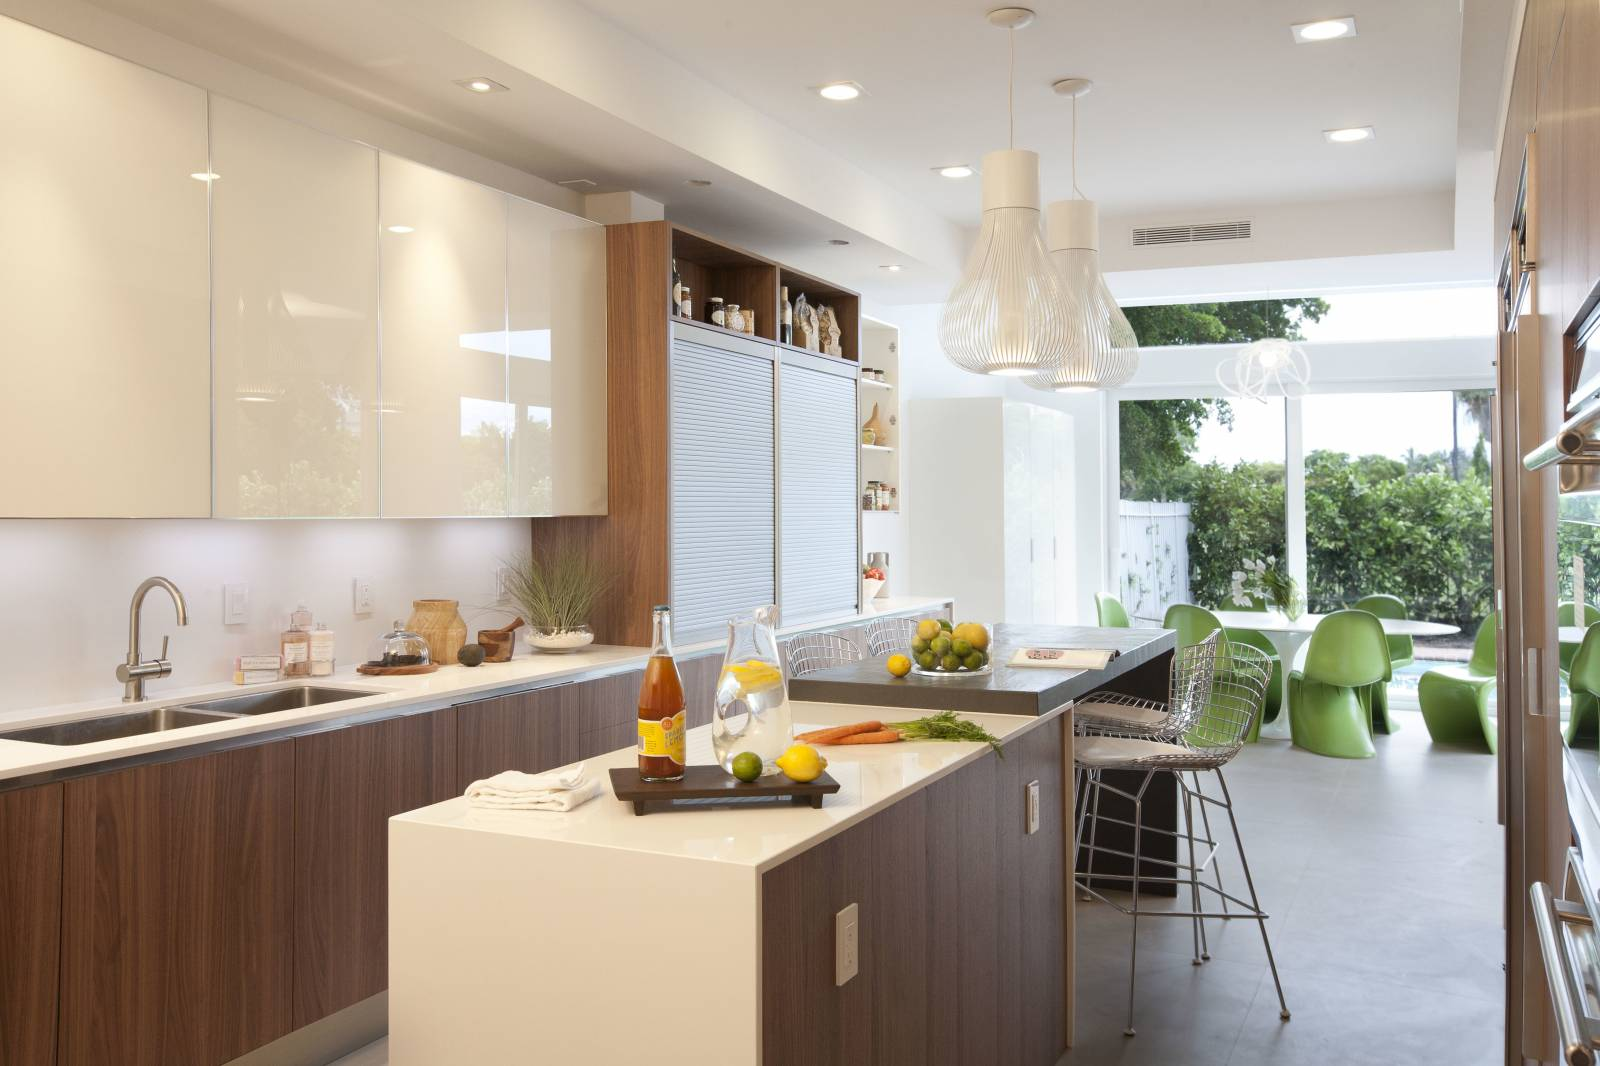 Интерьер дизайн кухни мебель